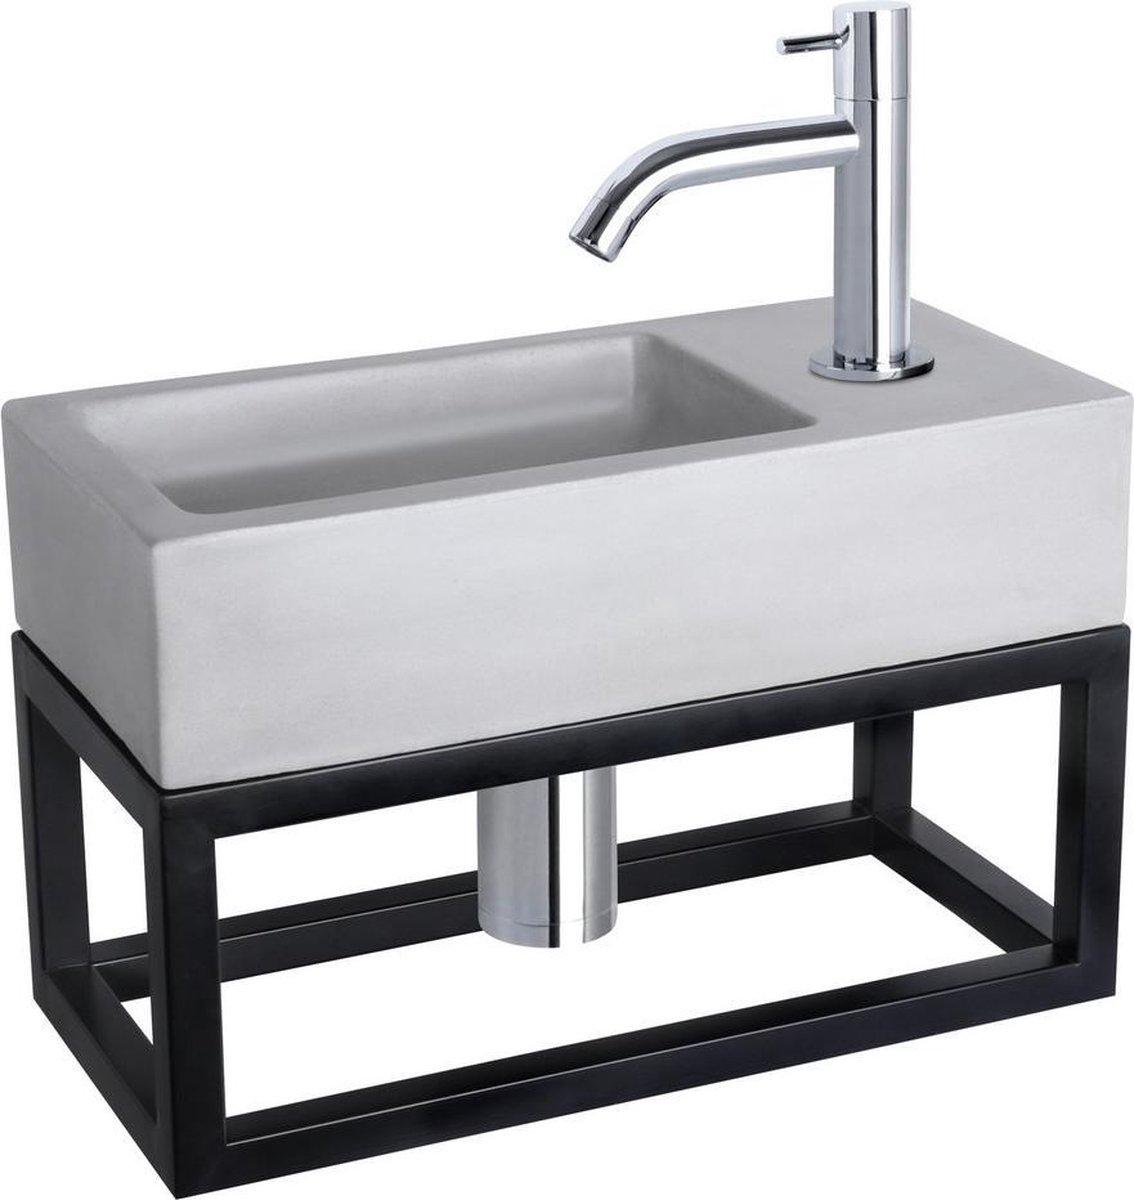 Differnz Ravo Fonteinset - Beton lichtgrijs - Kraan gebogen chroom - Met handdoekrek - 38.5 x 18.5 x 9 cm